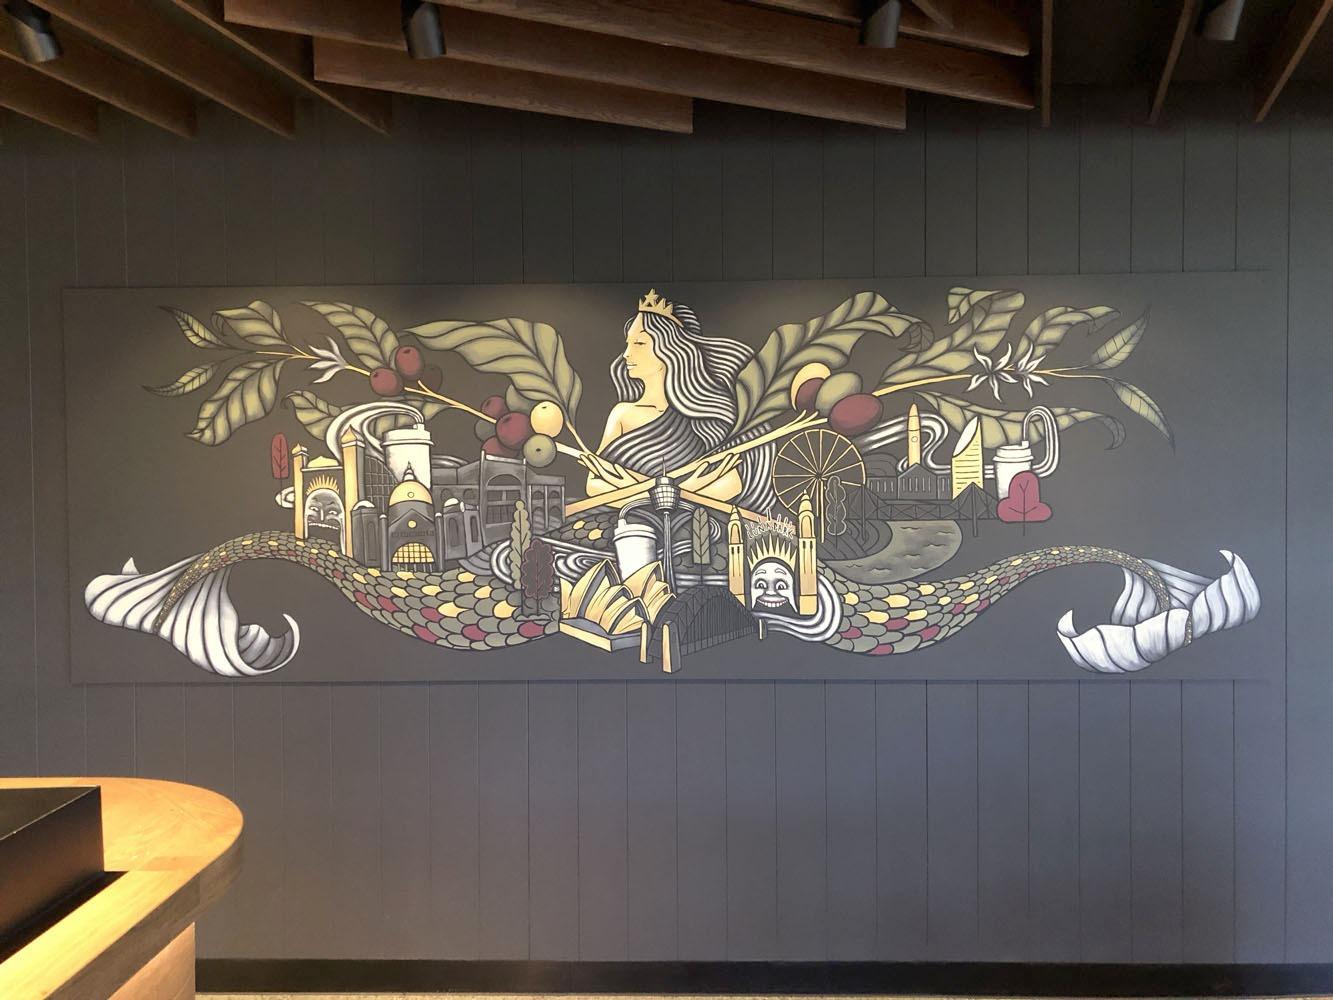 the-art-of-wall-starbucks-office-mural-melbourne-sydney-brisbane-wall-art-1